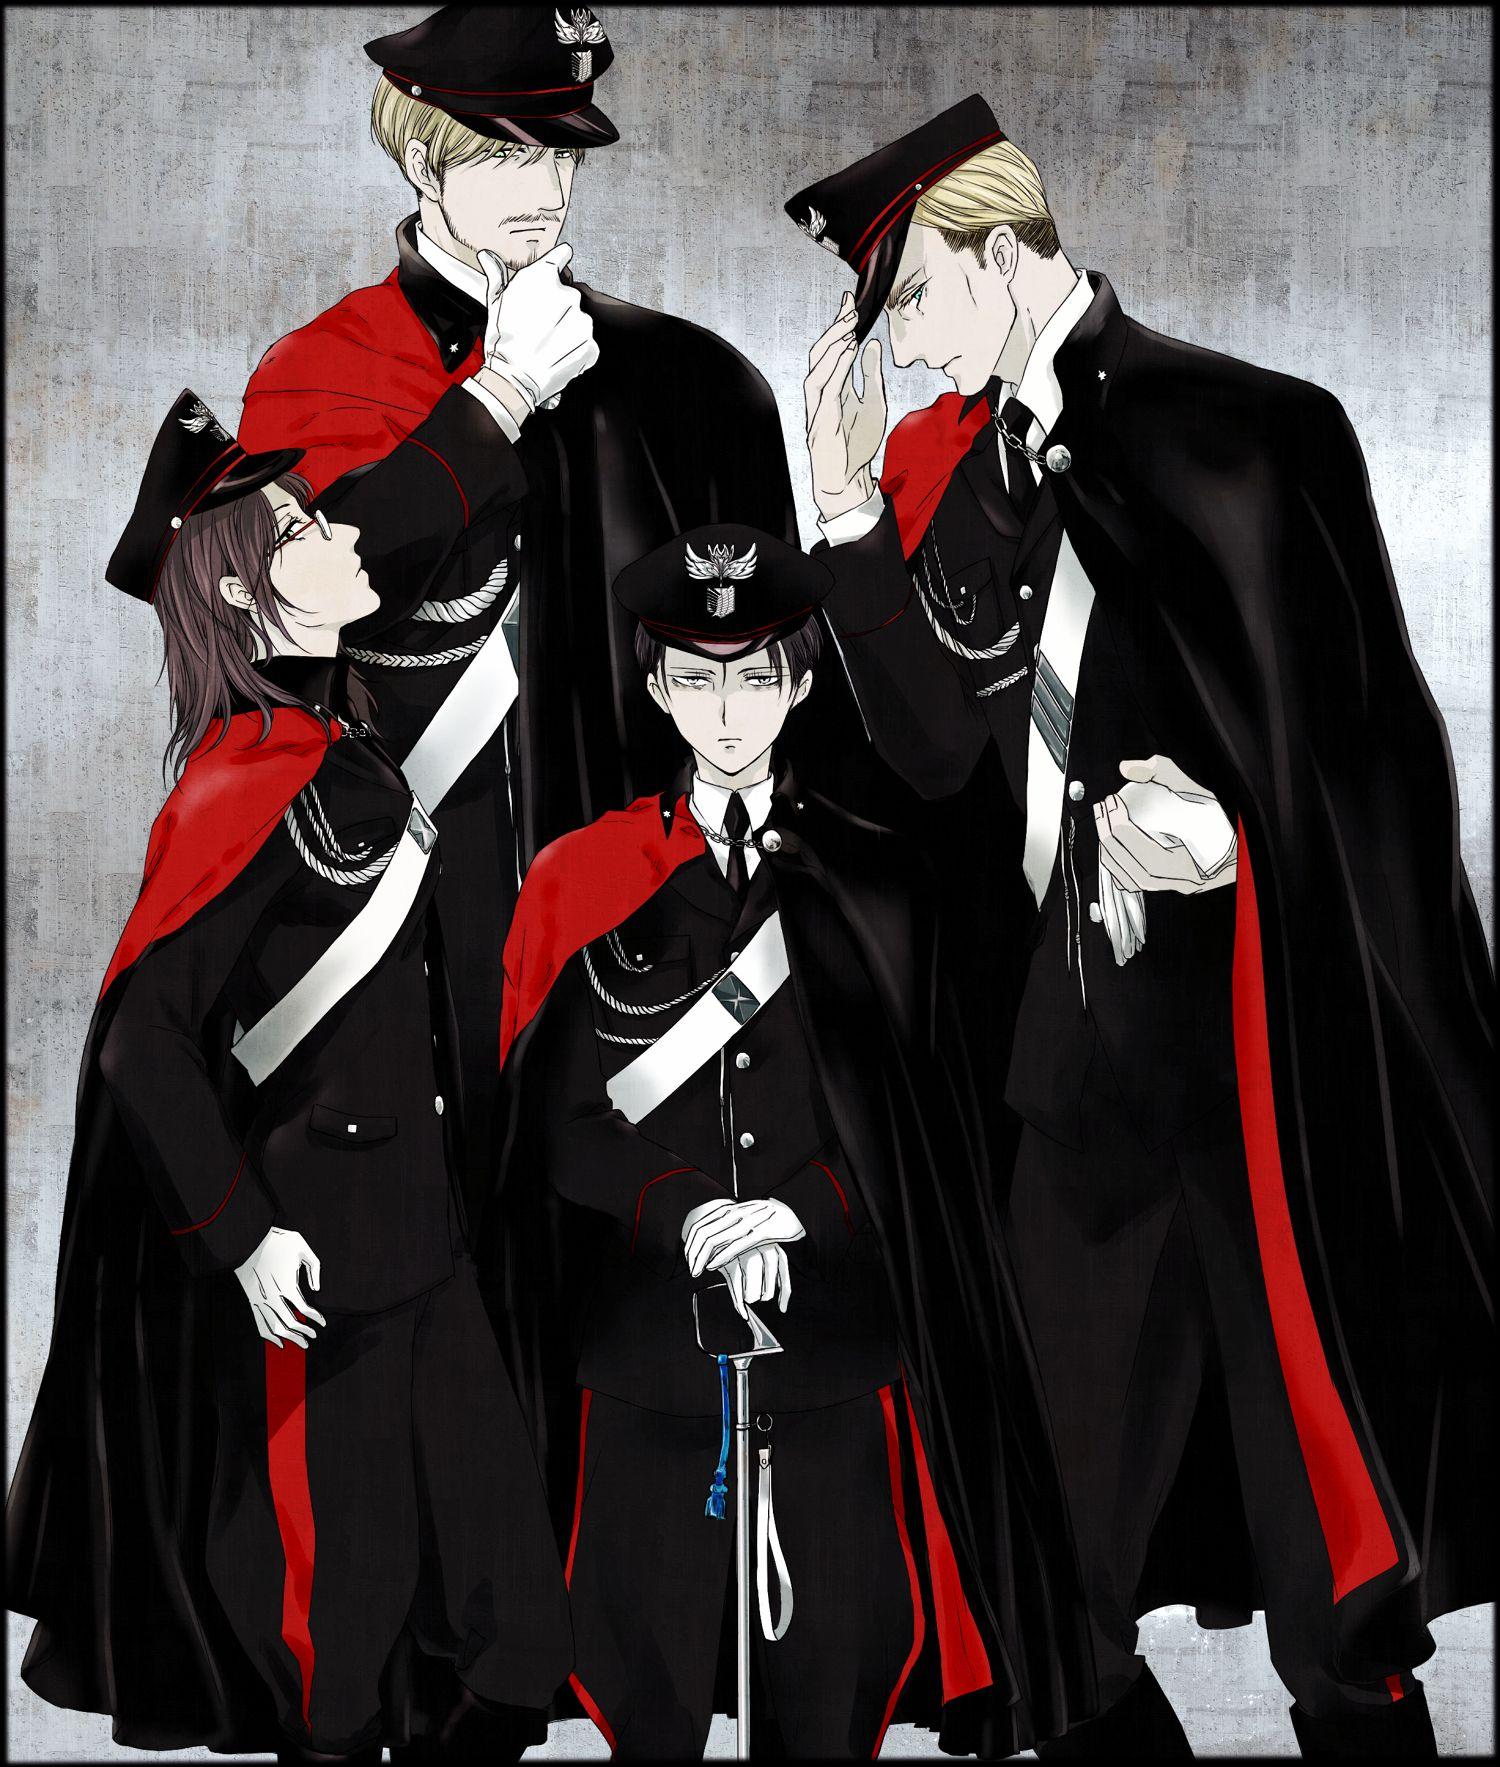 Shingeki no Kyojin, Mike Zacarius, Hange Zoë, Levi, Erwin